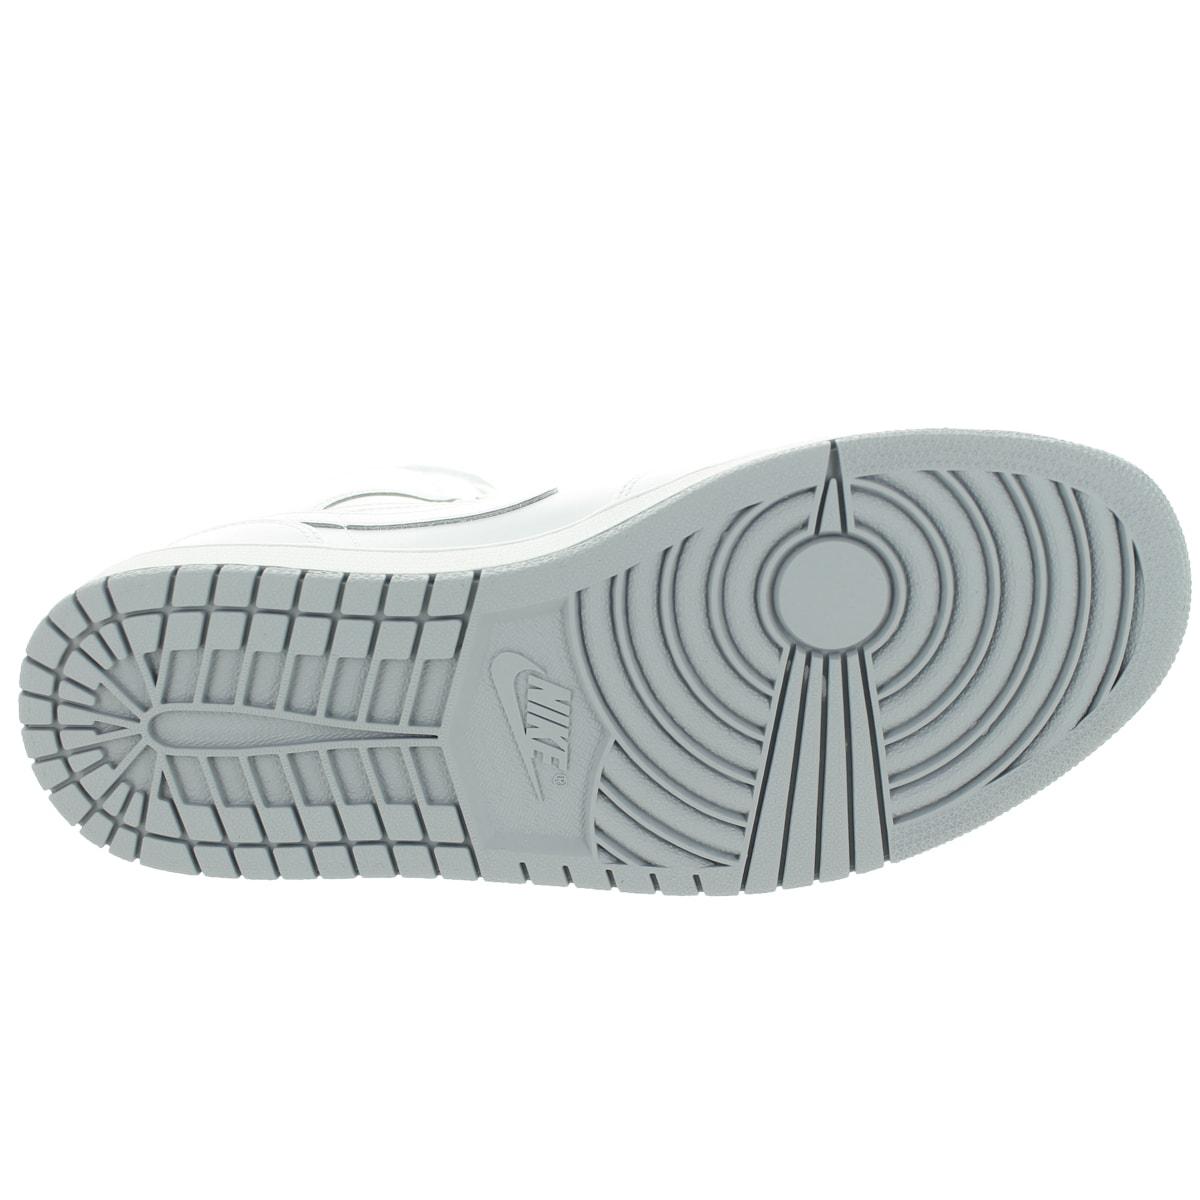 Shop Nike Jordan Men s Air Jordan 1 Mid White White Wolf Grey Basketball  Shoe - Free Shipping Today - Overstock - 12318717 7f14327d6